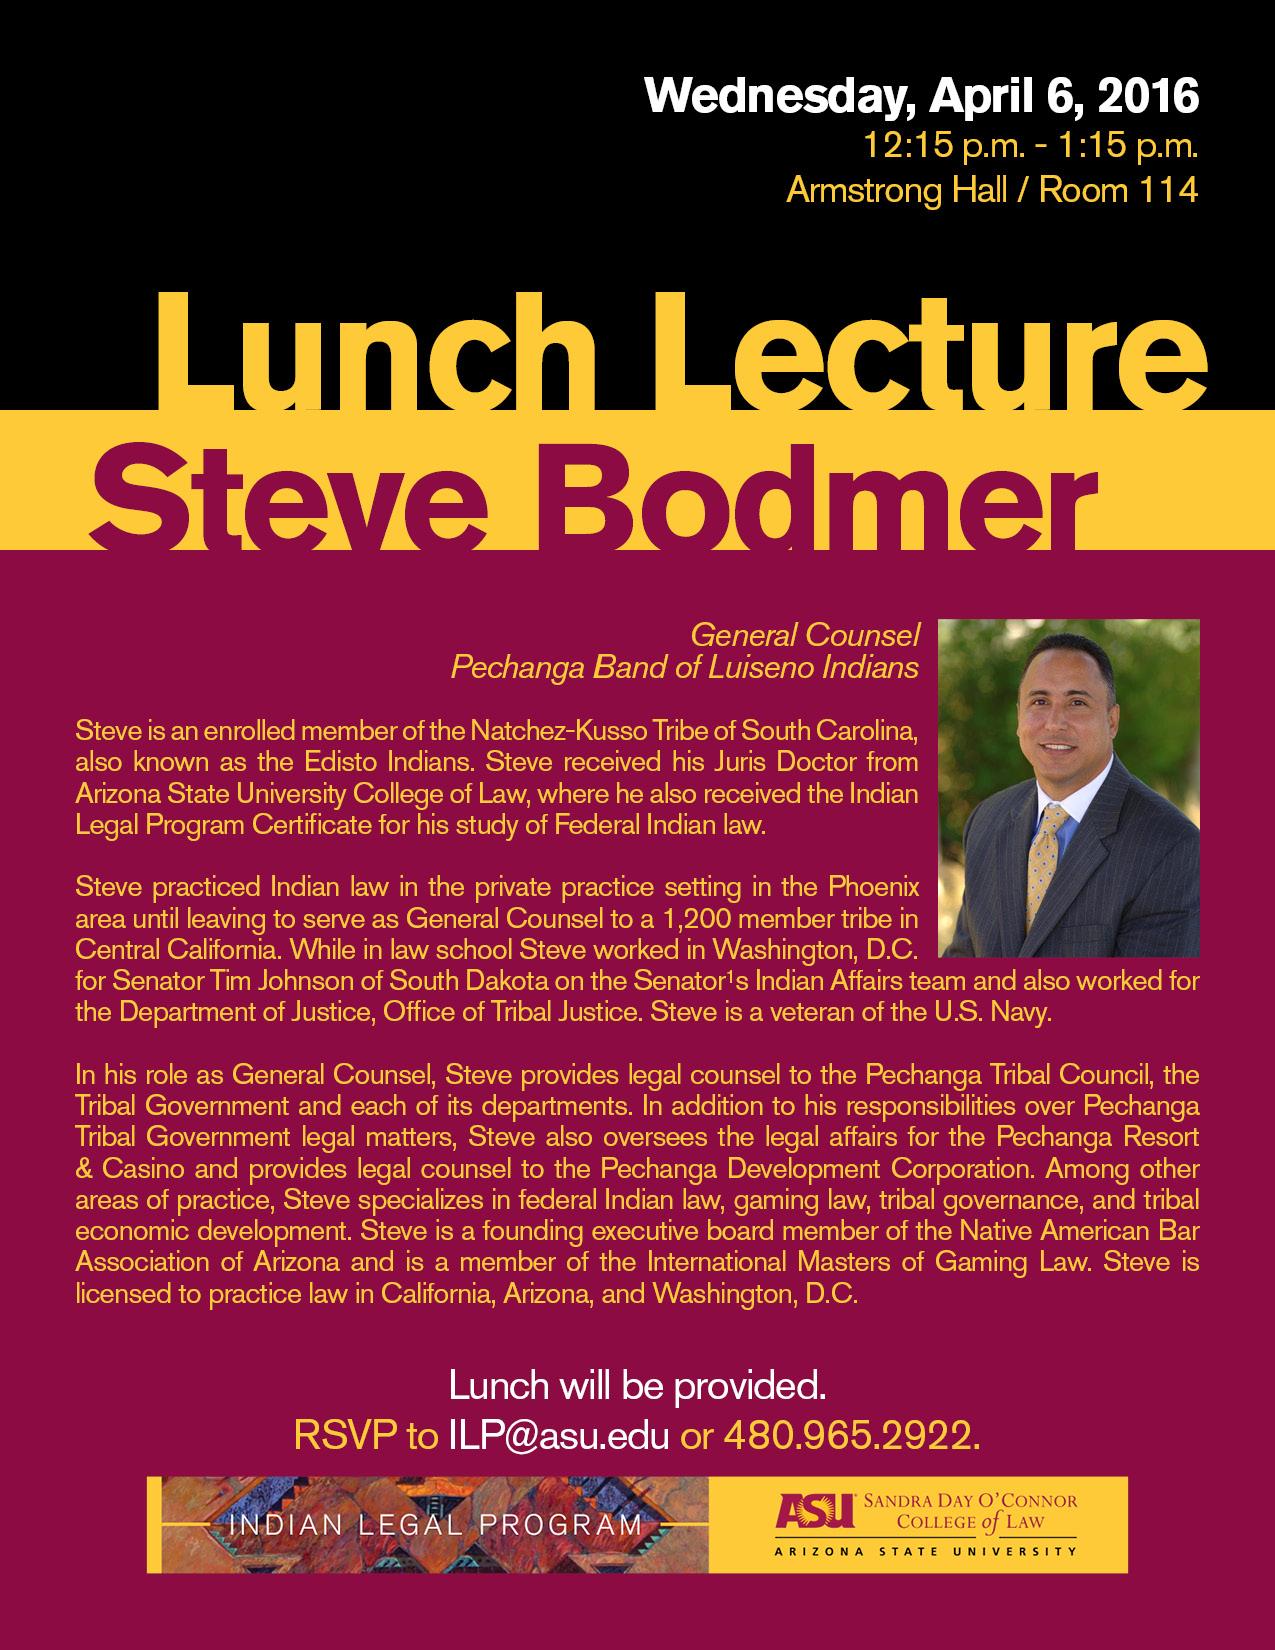 Steve Bodmer